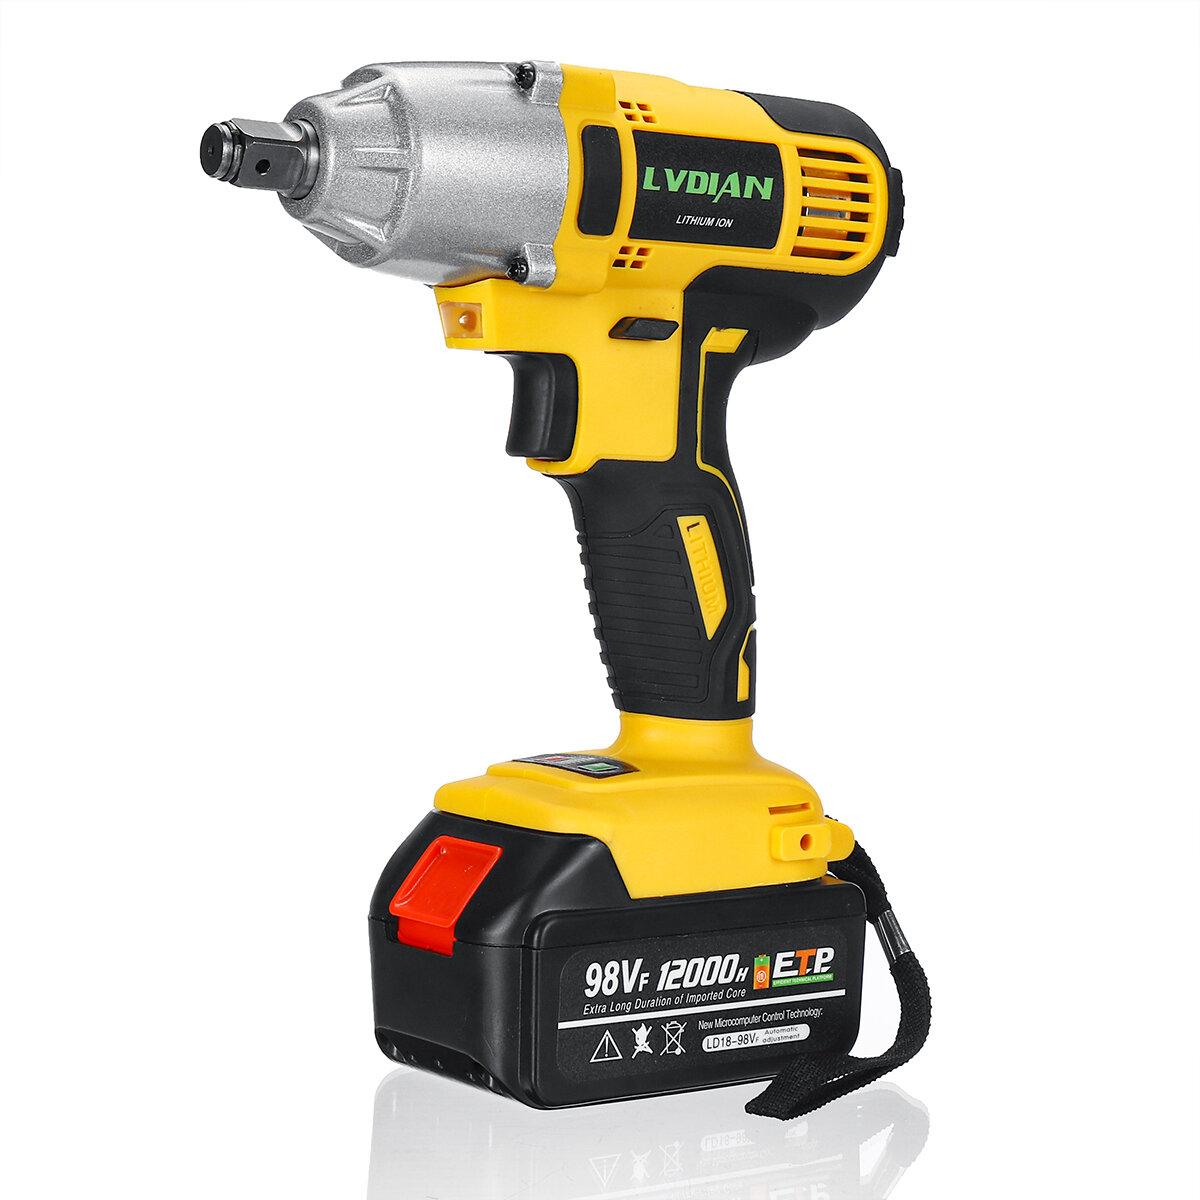 98VF 320Nm 12000mAh Cordless Electric Impact Wrench Drill Screwdriver 110-240V